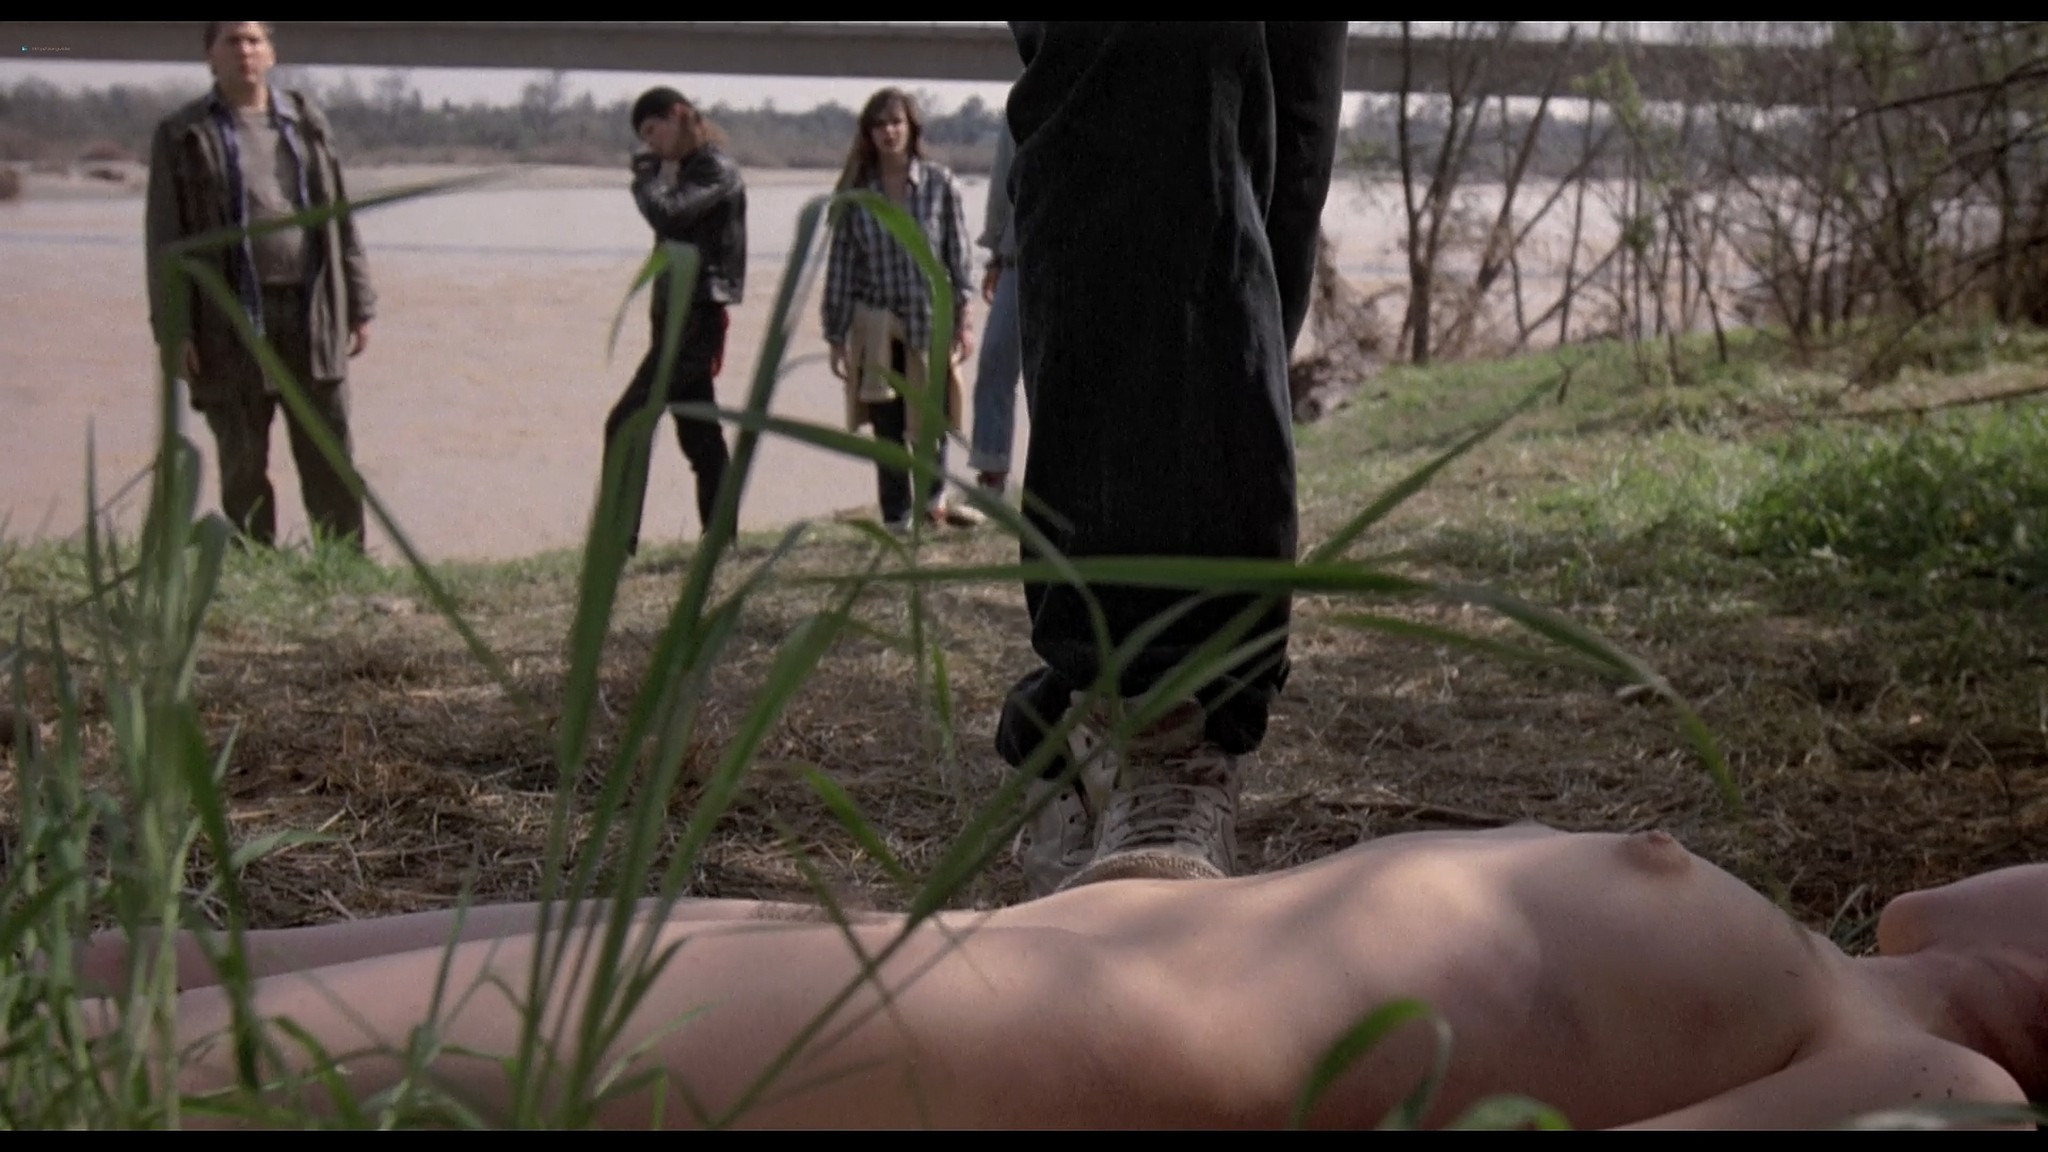 Danyi Deats nude bush topless but dead Rivers Edge 1986 HD 1080p BluRay 7